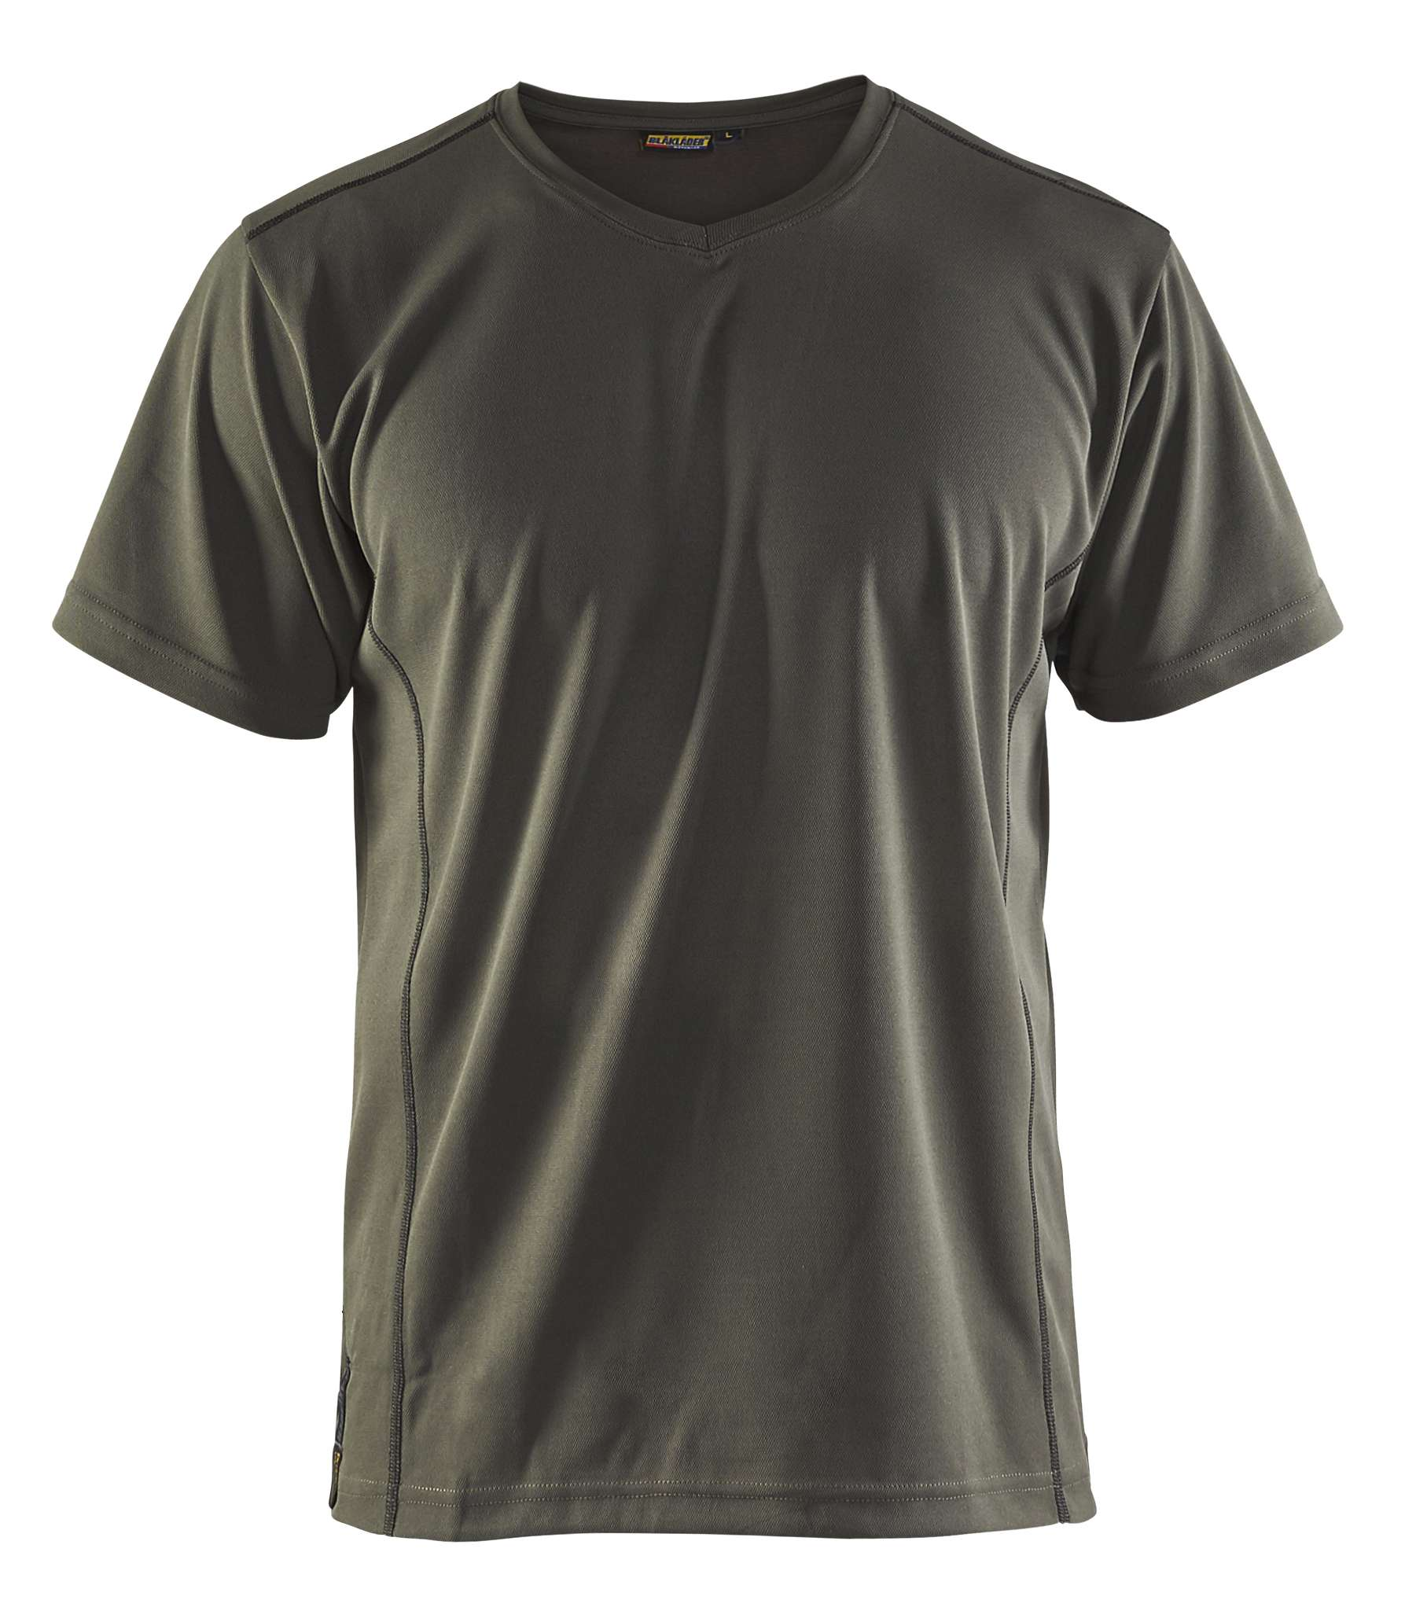 Blaklader T-shirts 33231051 army groen(4600)